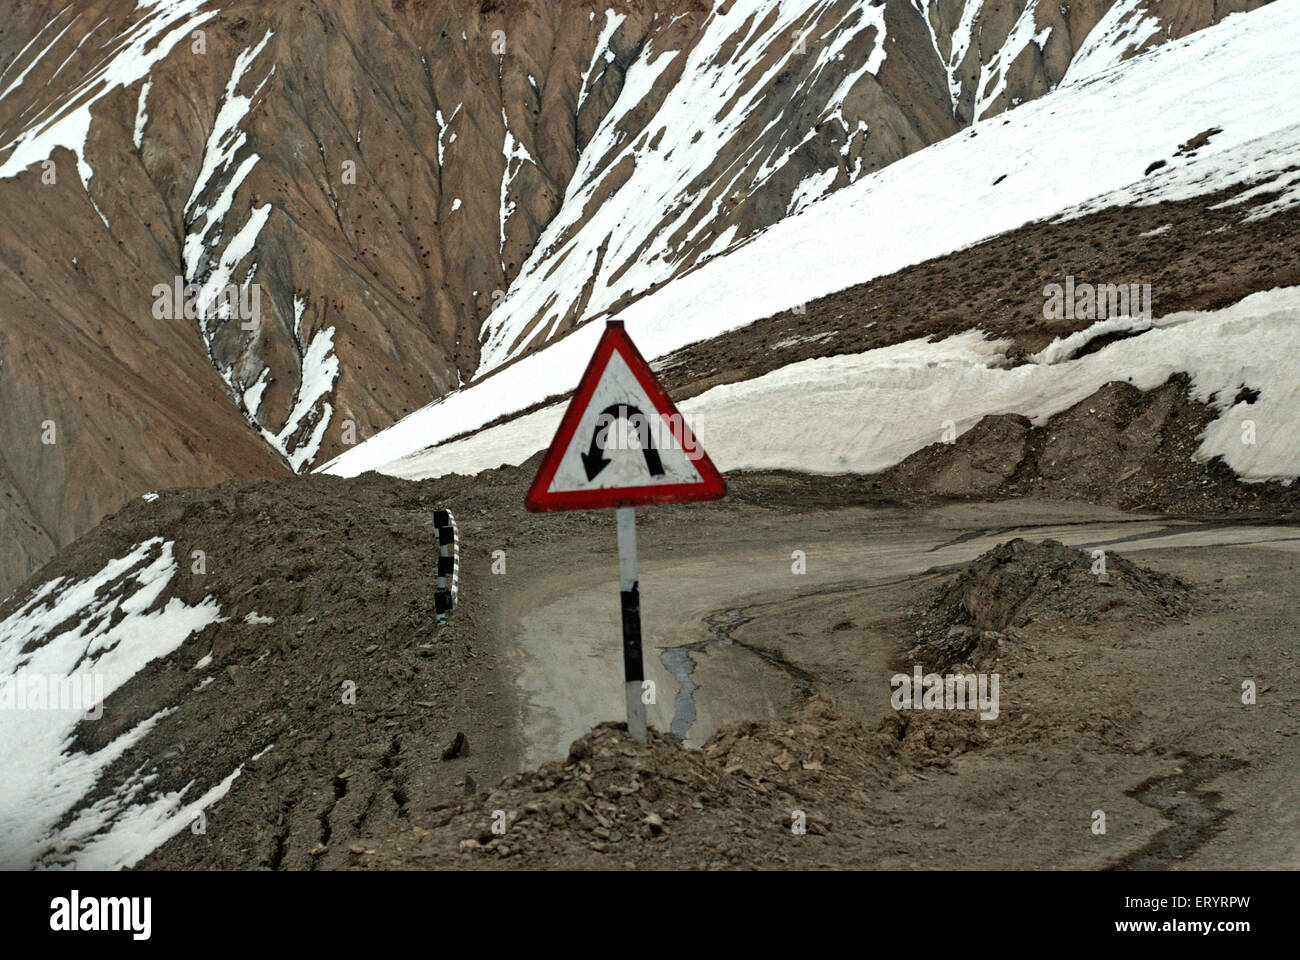 Left bend signboard on leh kargil road ; Ladakh ; Jammu and Kashmir ; India 9 April 2008 - Stock Image